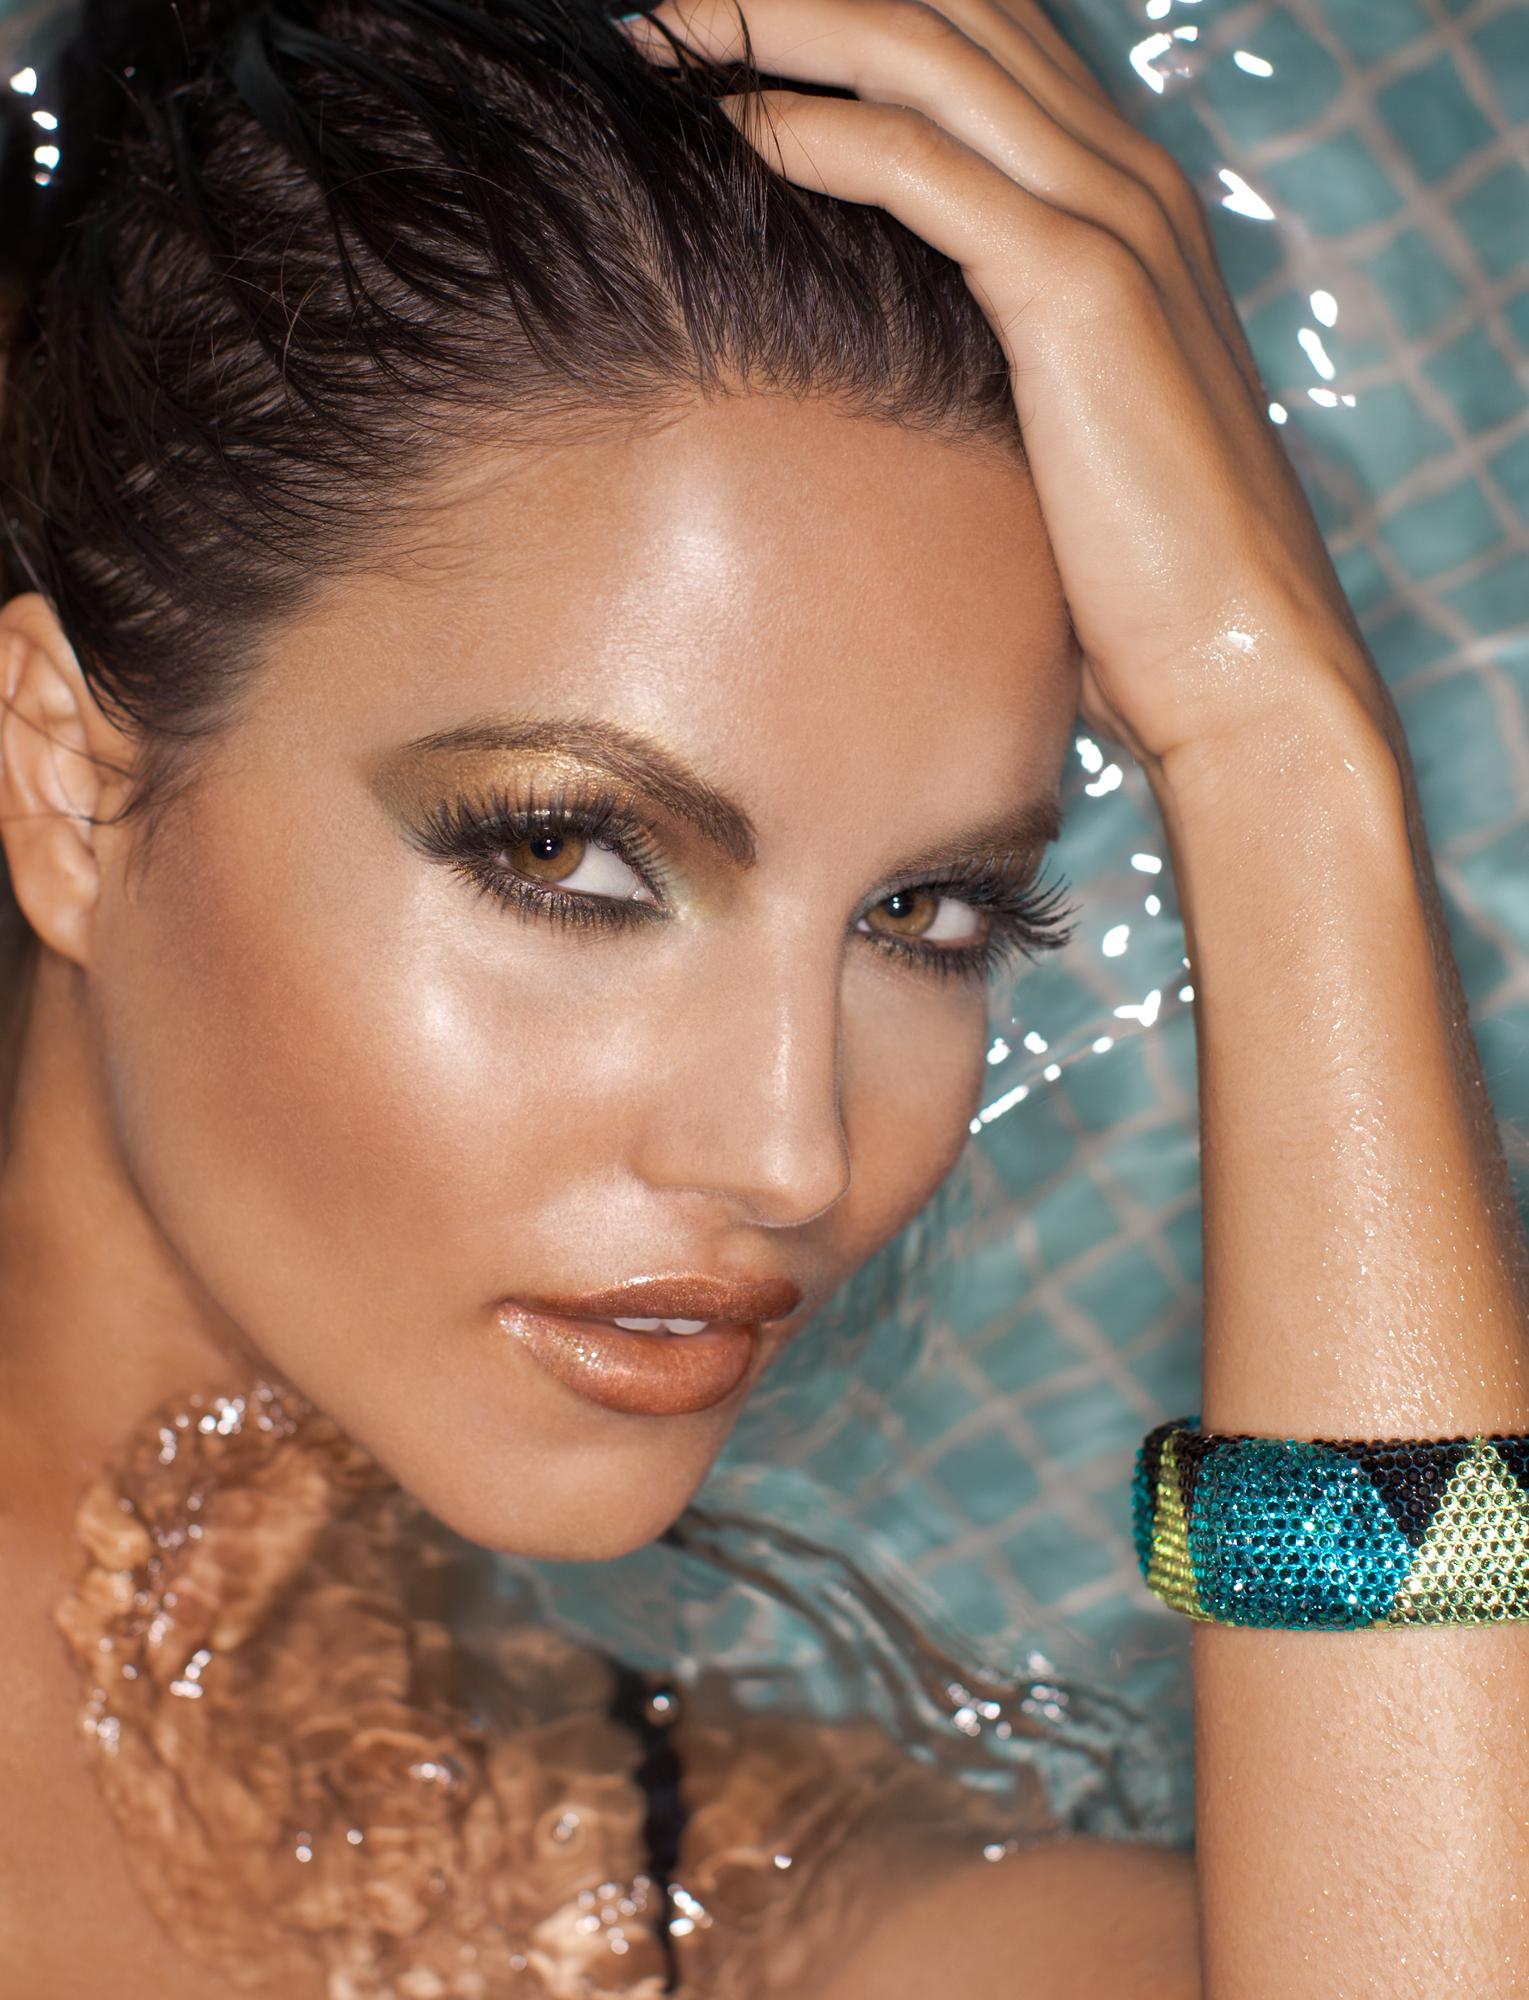 Beauty,eyeshadow,mascara,eyeliner,blush,makeupretouchingthomas-canny-studio_2.jpg